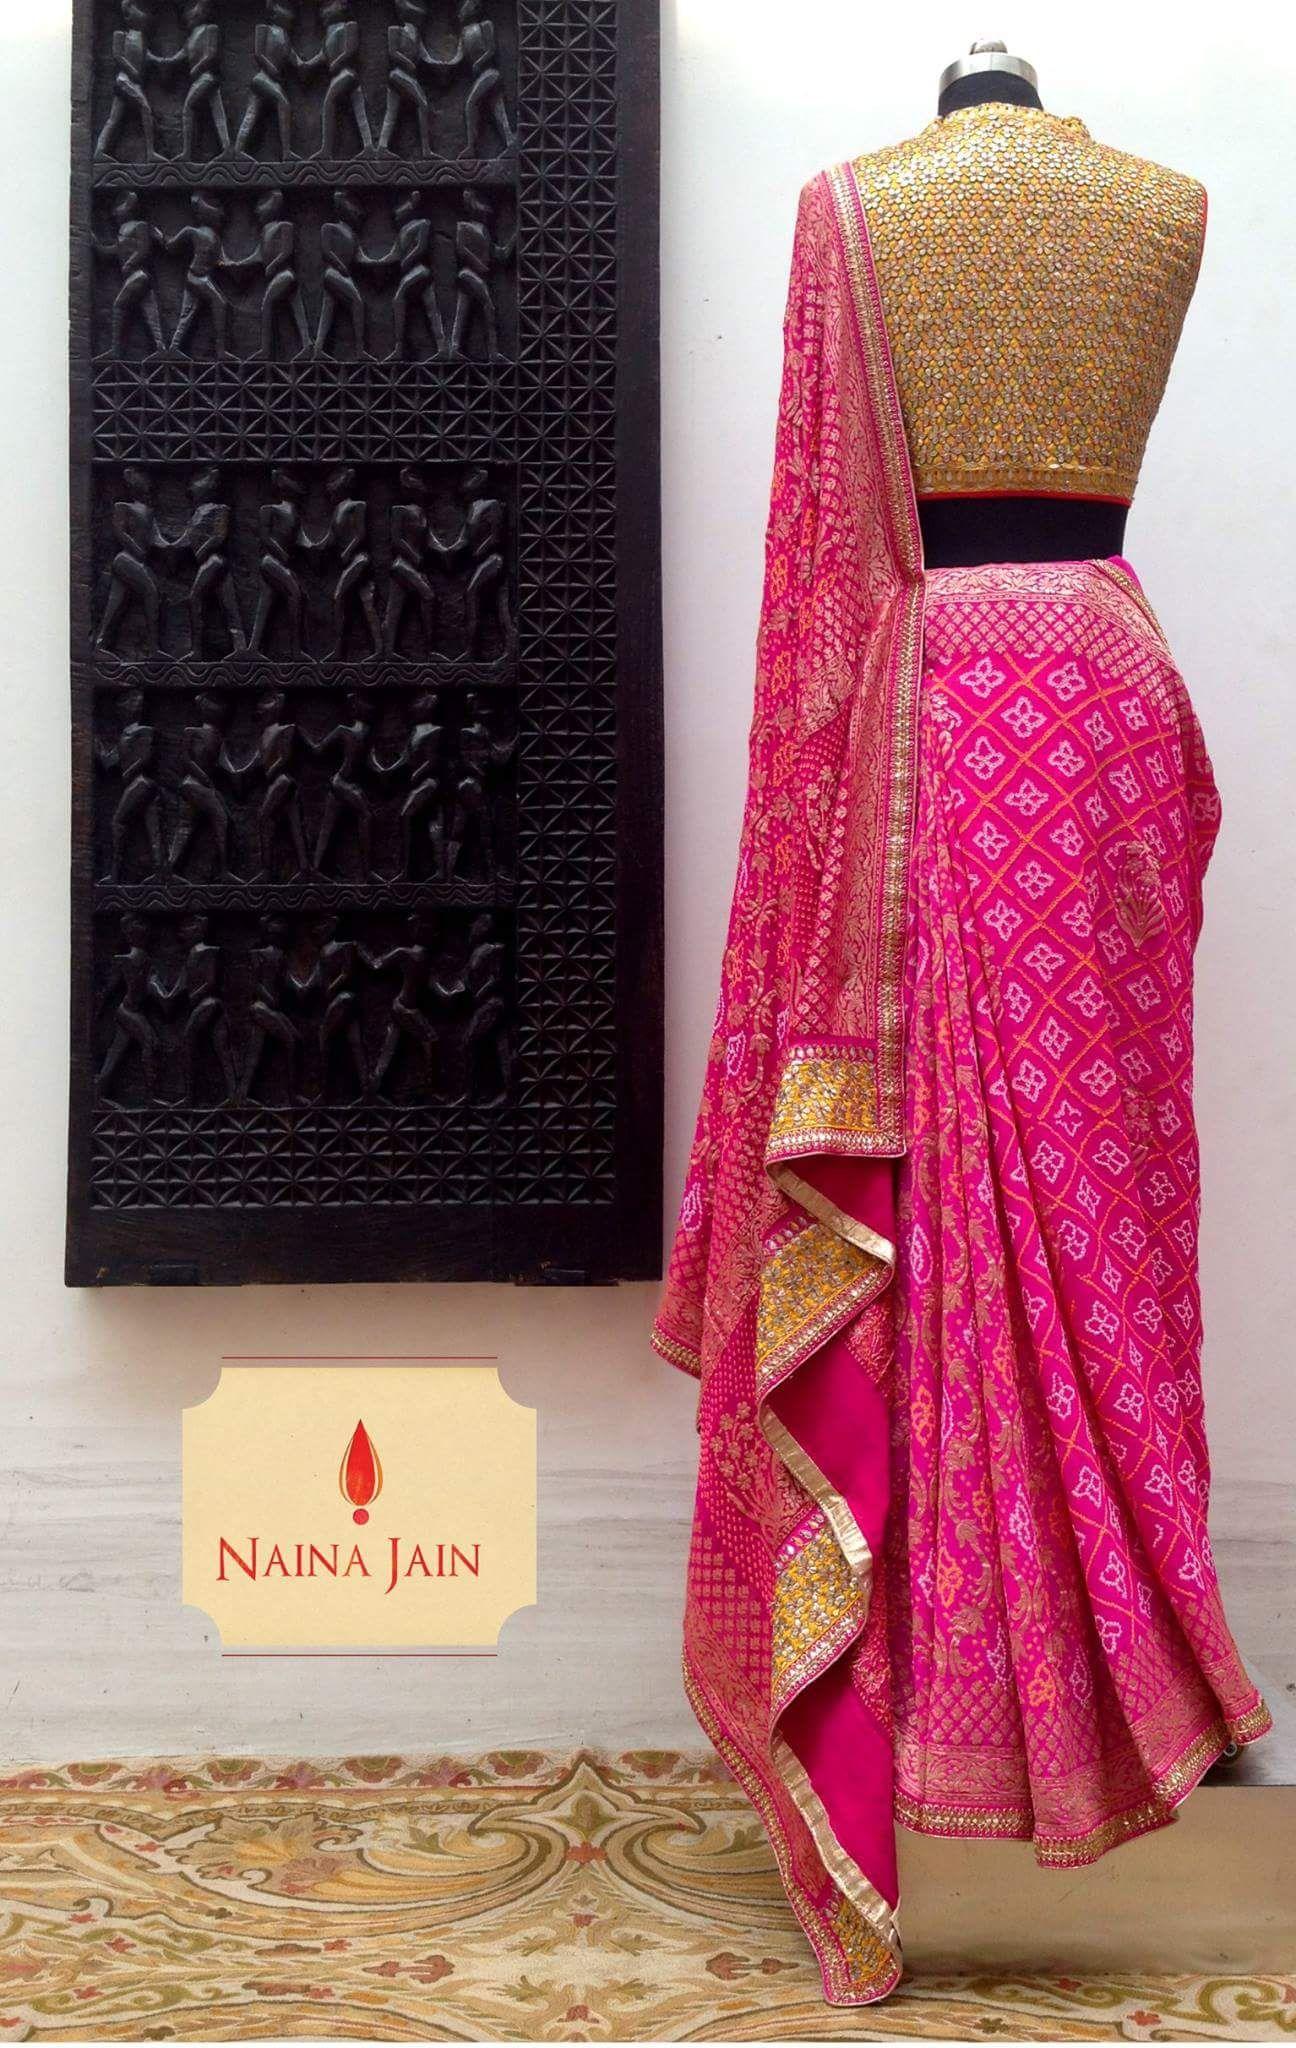 naina jain bandhni saree for this summer festive- ethnic and elegant ...